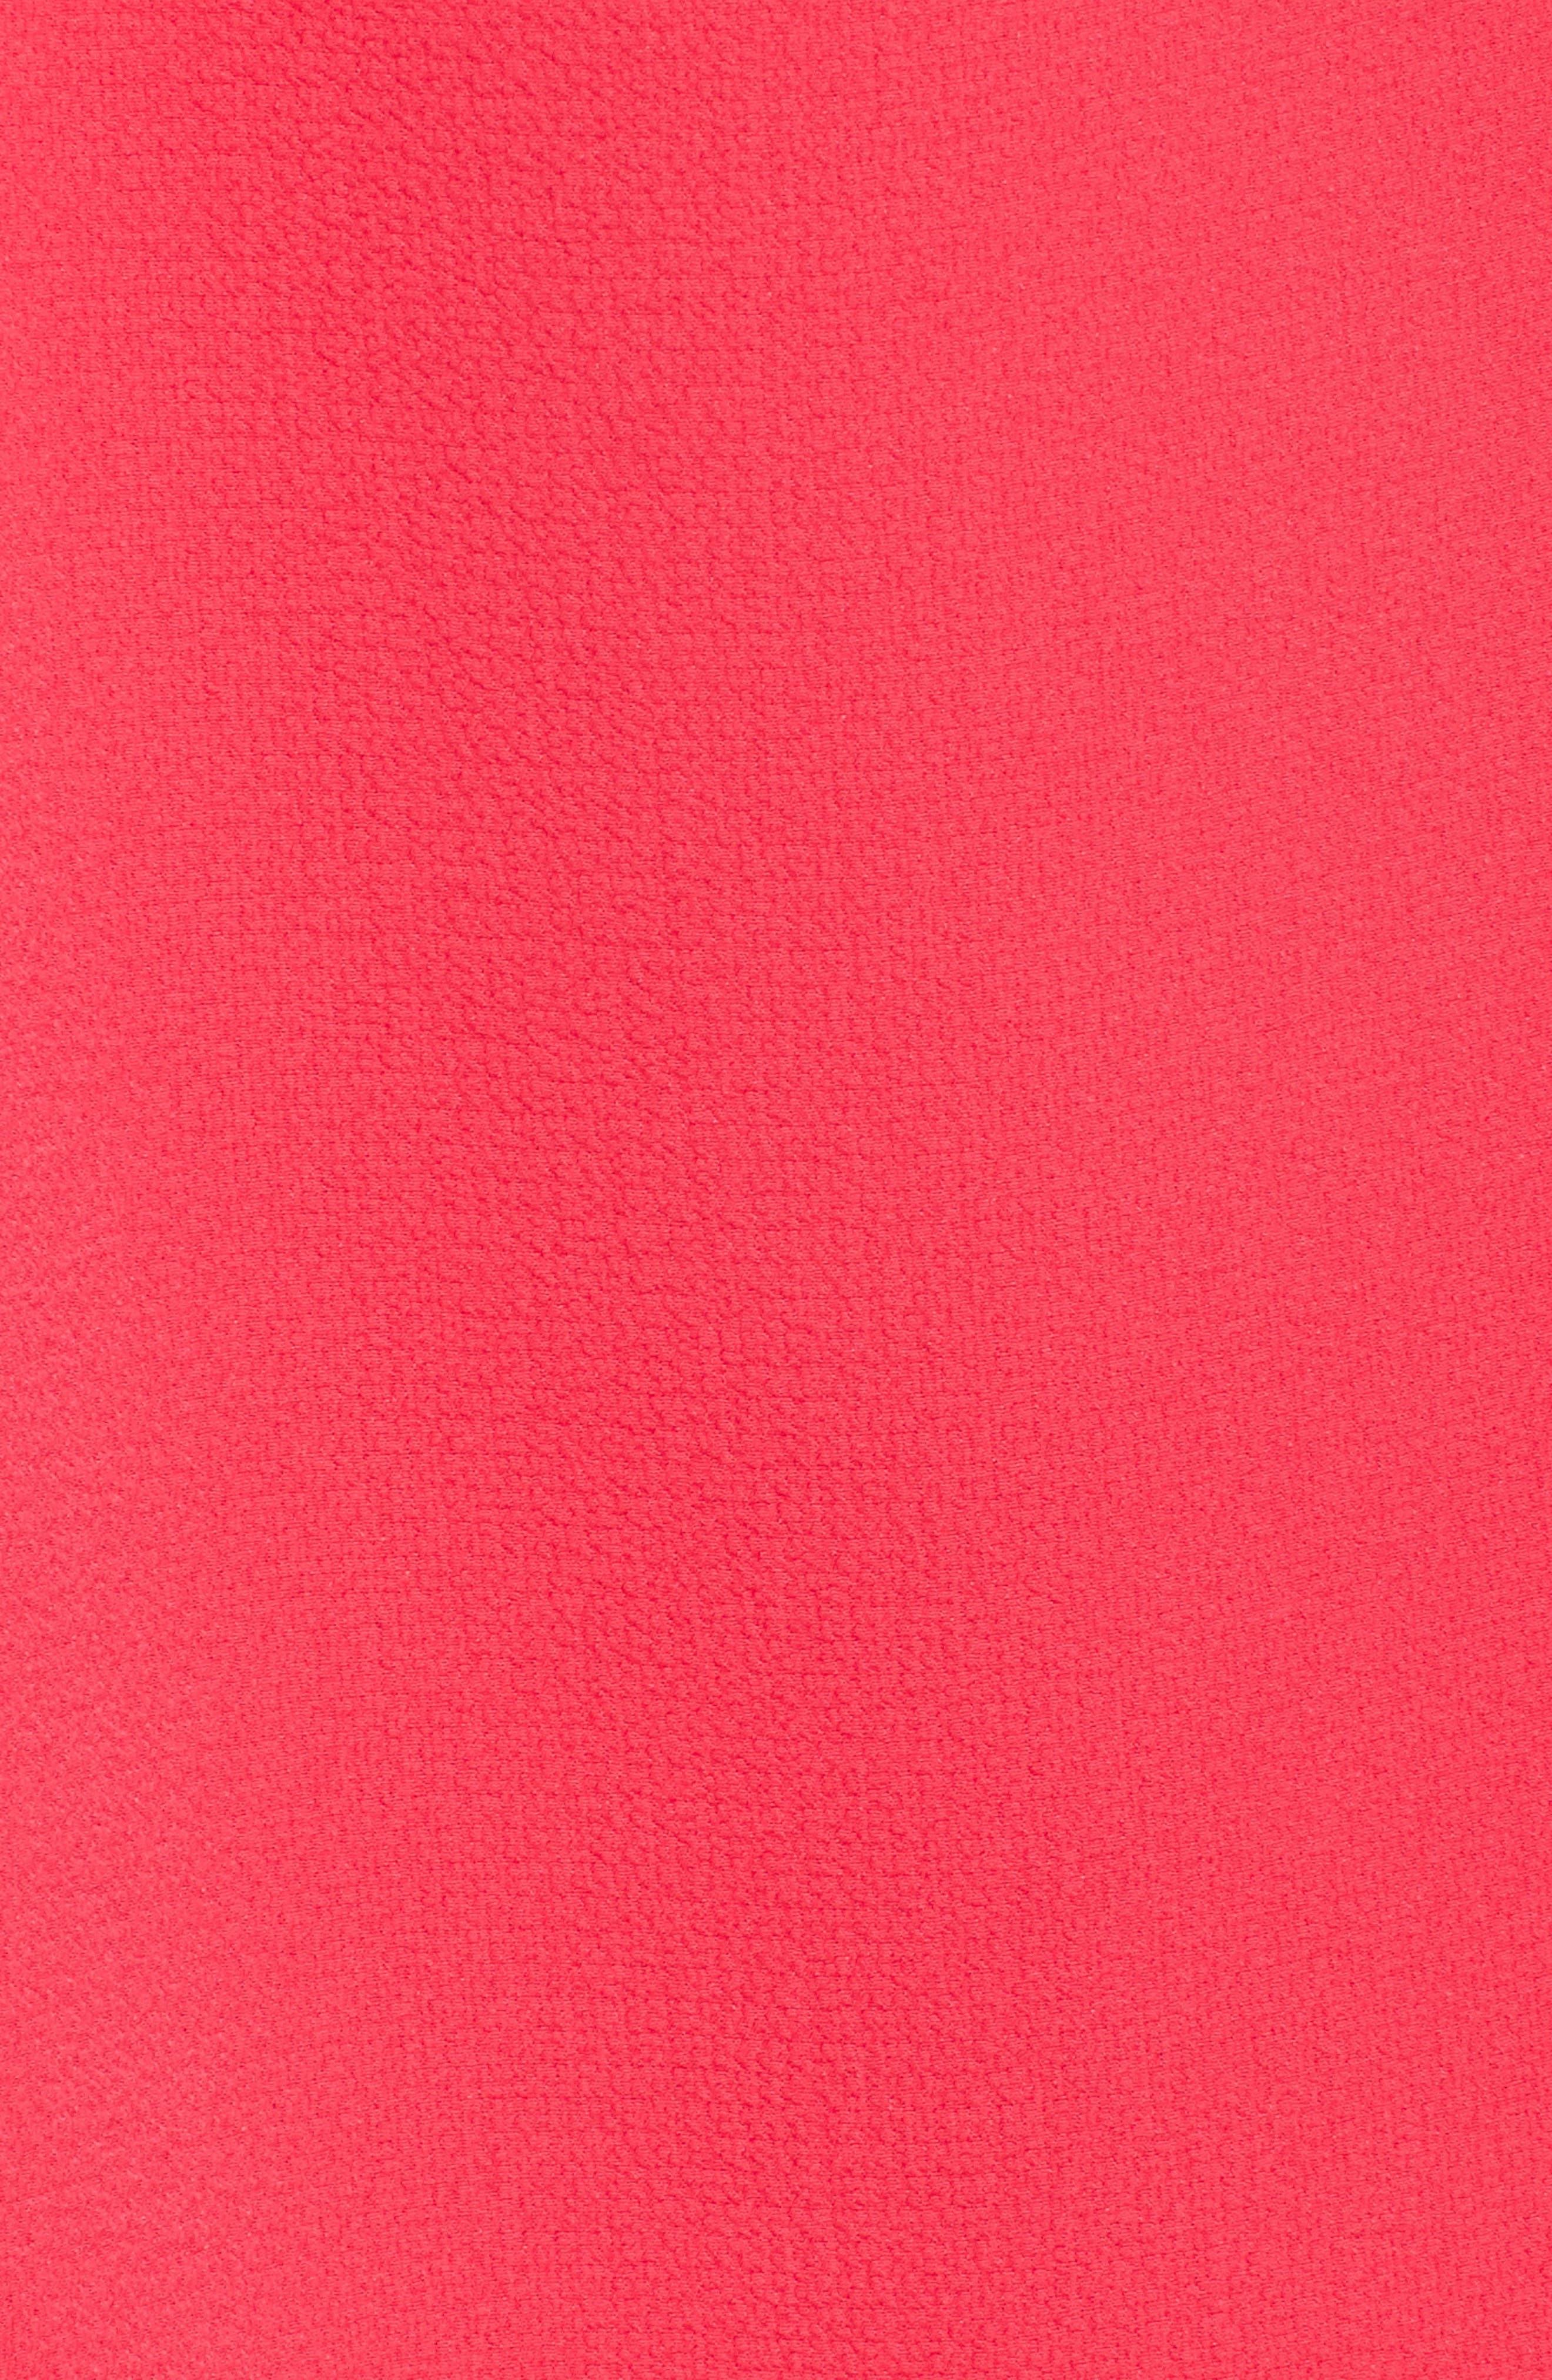 Zipper Back Ruffle Dress,                             Alternate thumbnail 16, color,